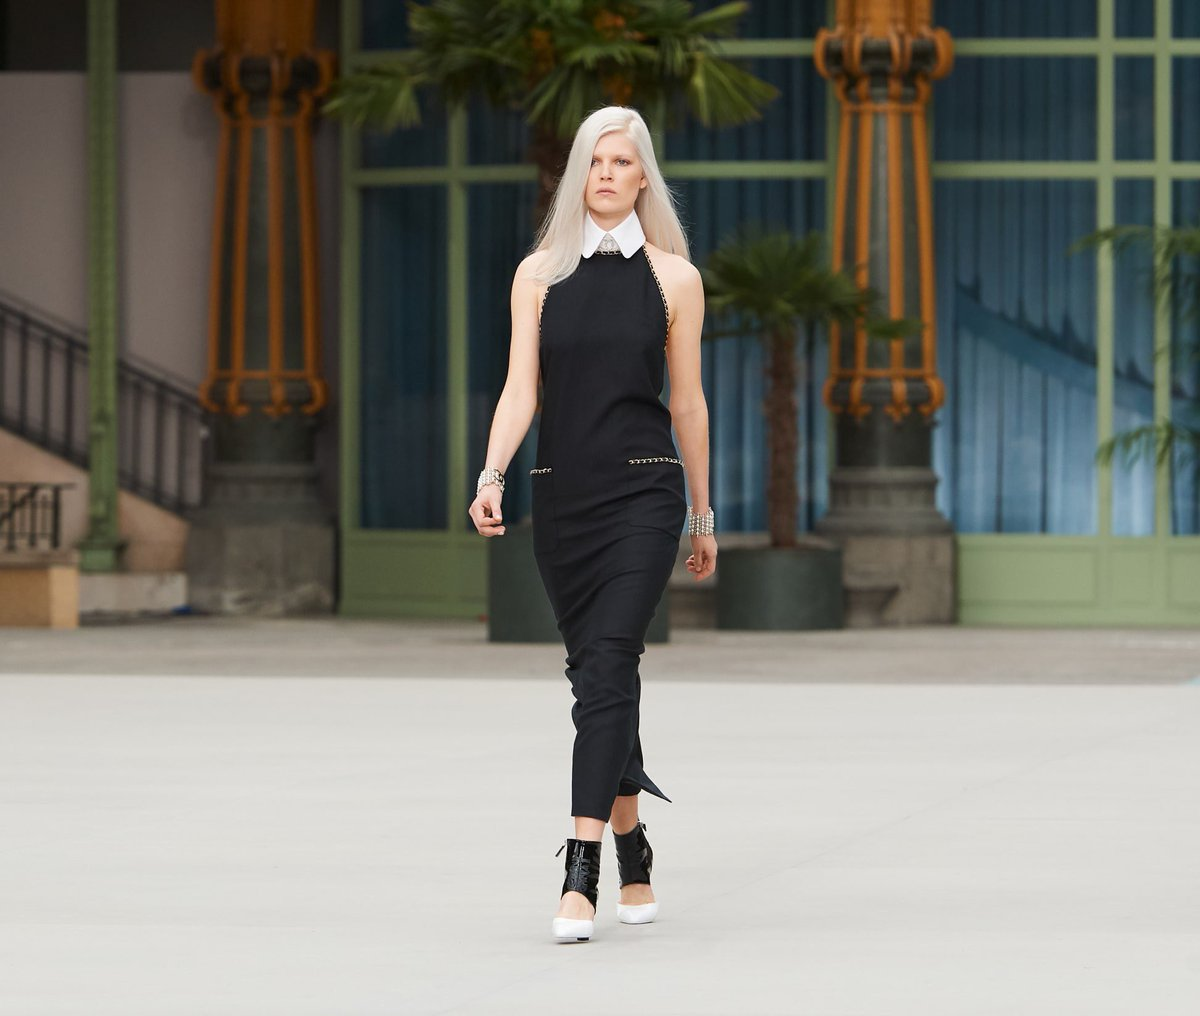 Looks of the #CHANELCruise 2019/20 collection, designed by #VirginieViard #DestinationCHANEL | Visit https://t.co/D1Kctf3DPO L'héritage de Coco Chanel #espritdegabrielle © #CHANEL https://t.co/8jEOZworwX